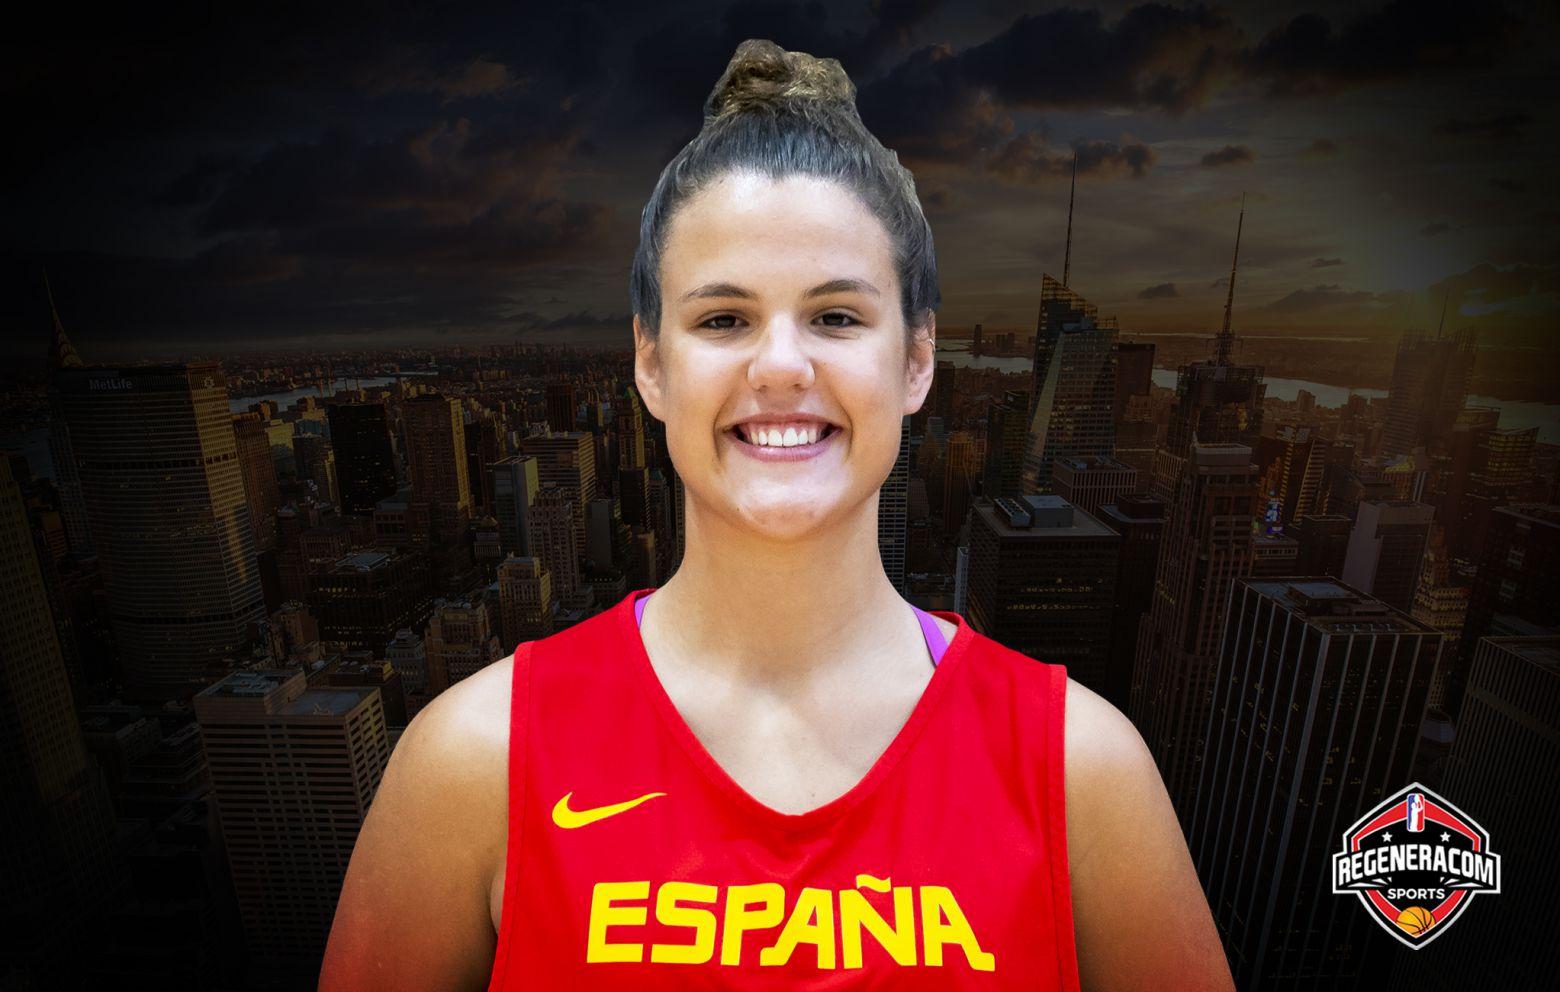 TXELL ALARCÓN has signed with Regeneracom Sports